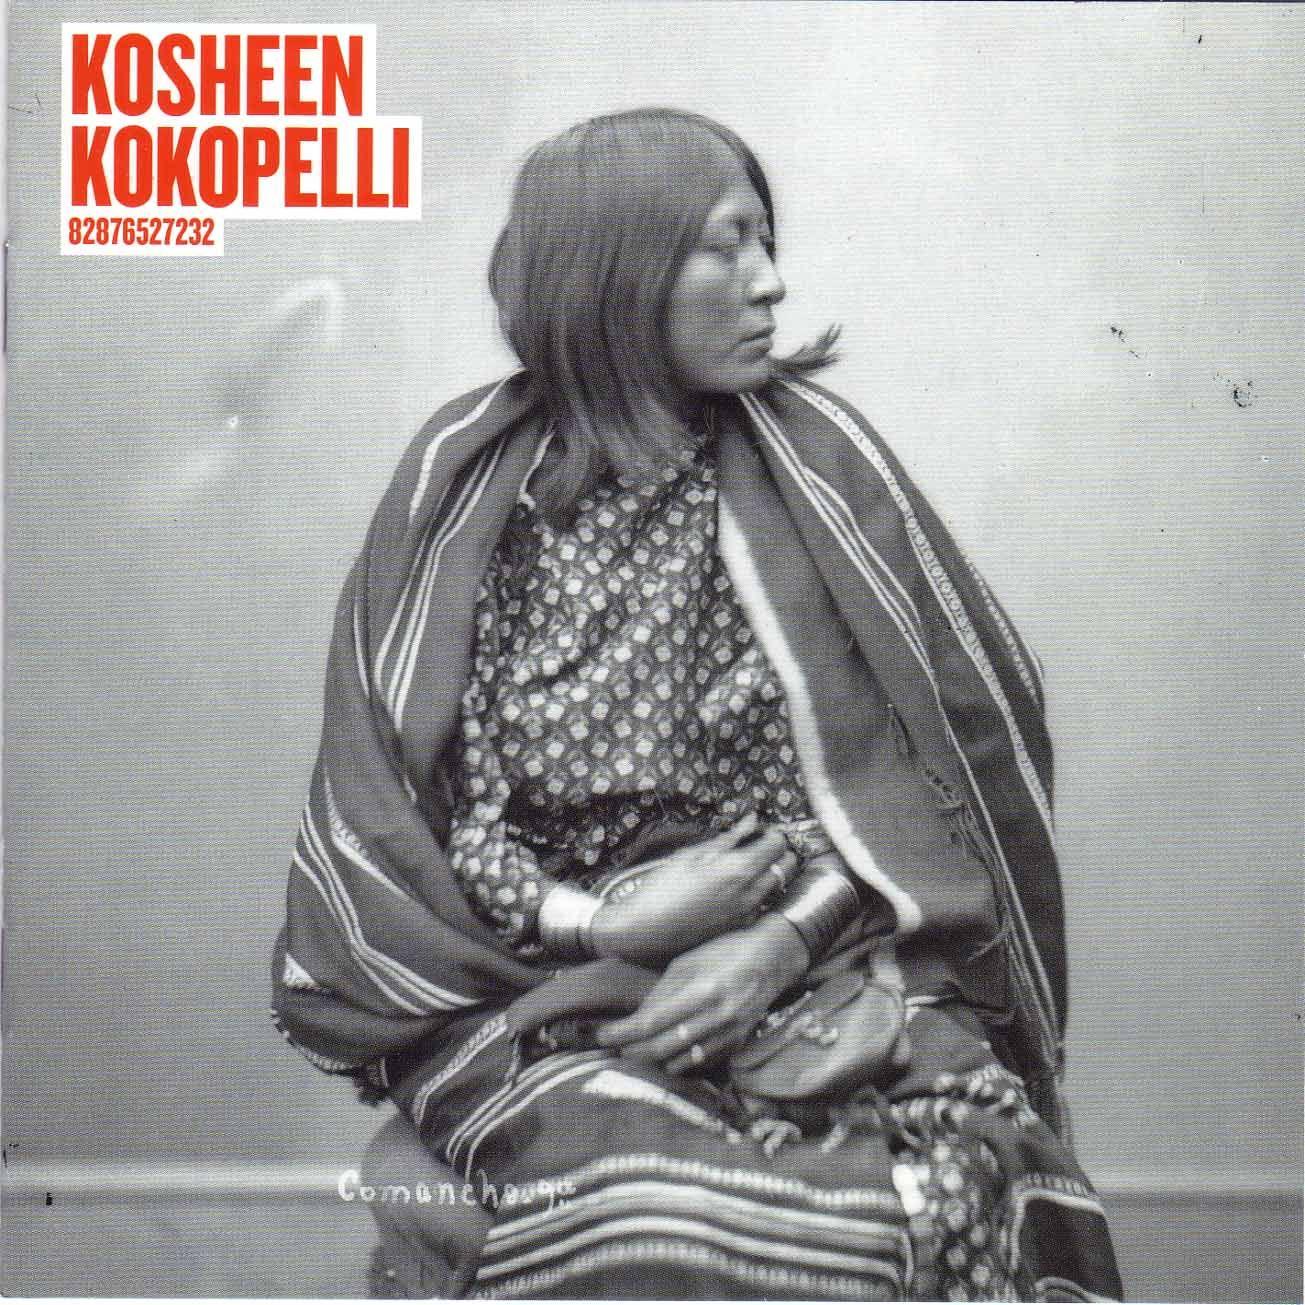 Kosheen - Kokopelli album cover